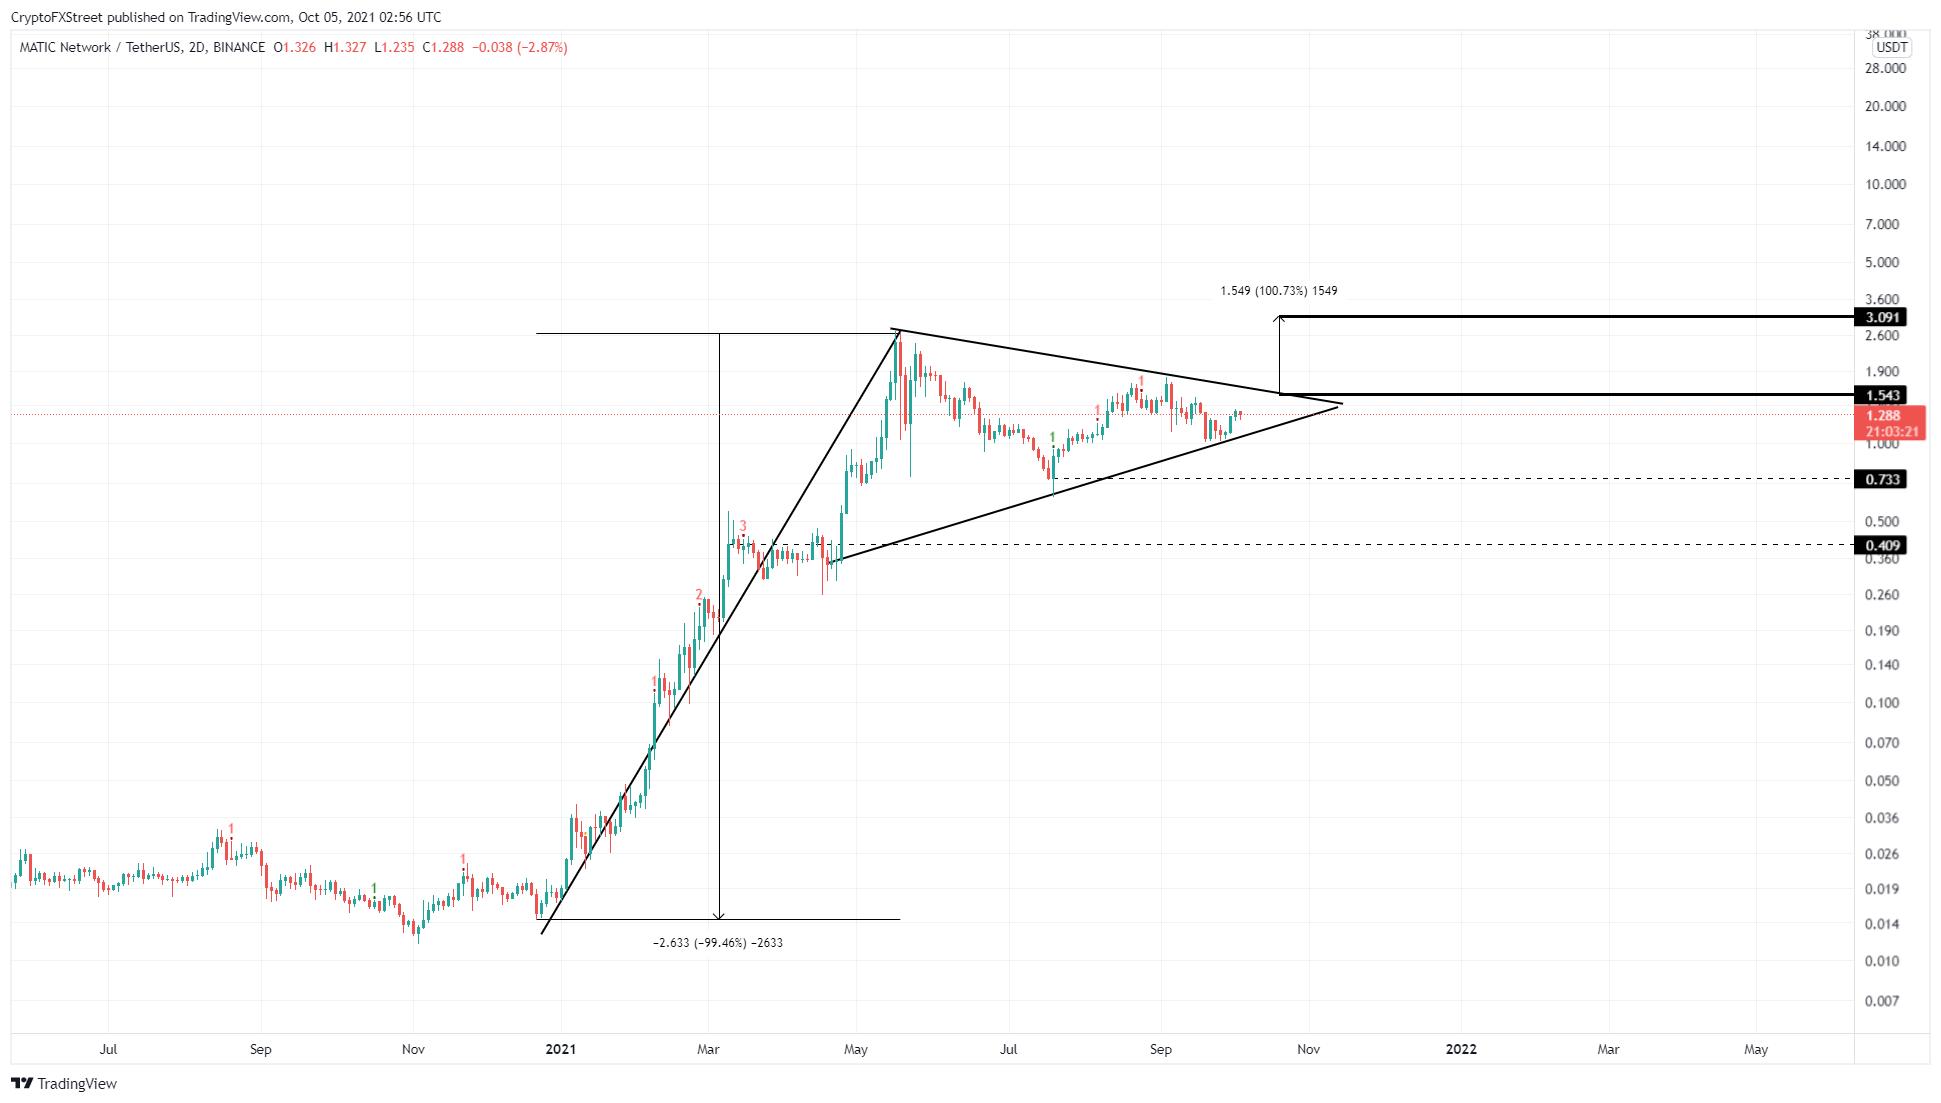 MATIC/USDT 2-day chart